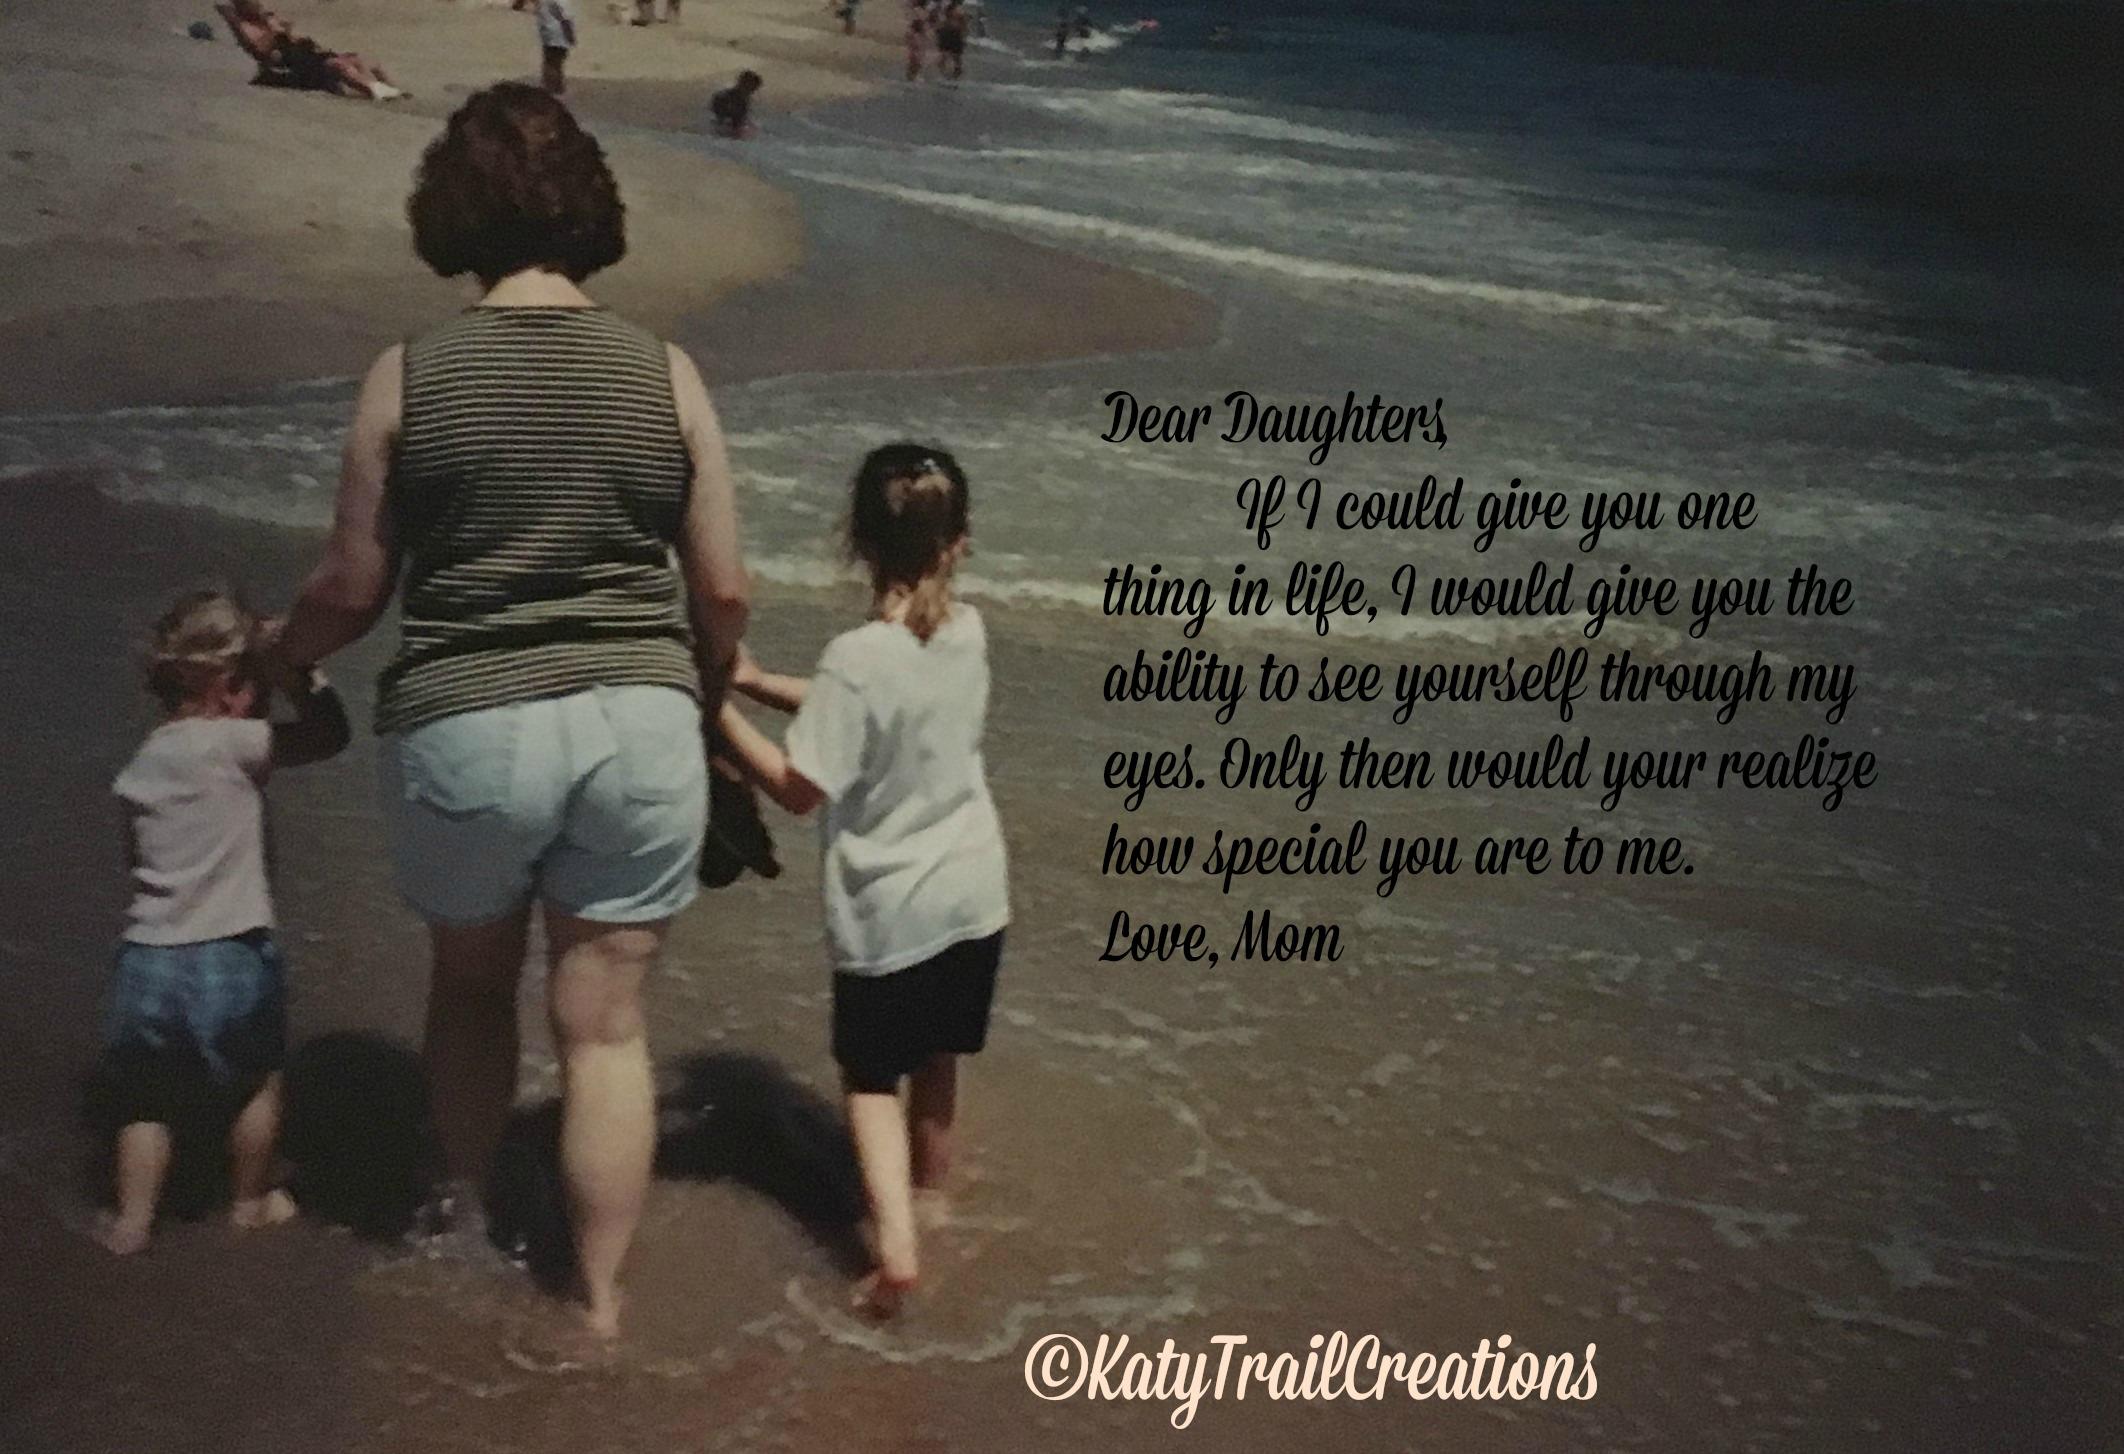 MothersDay2017letter